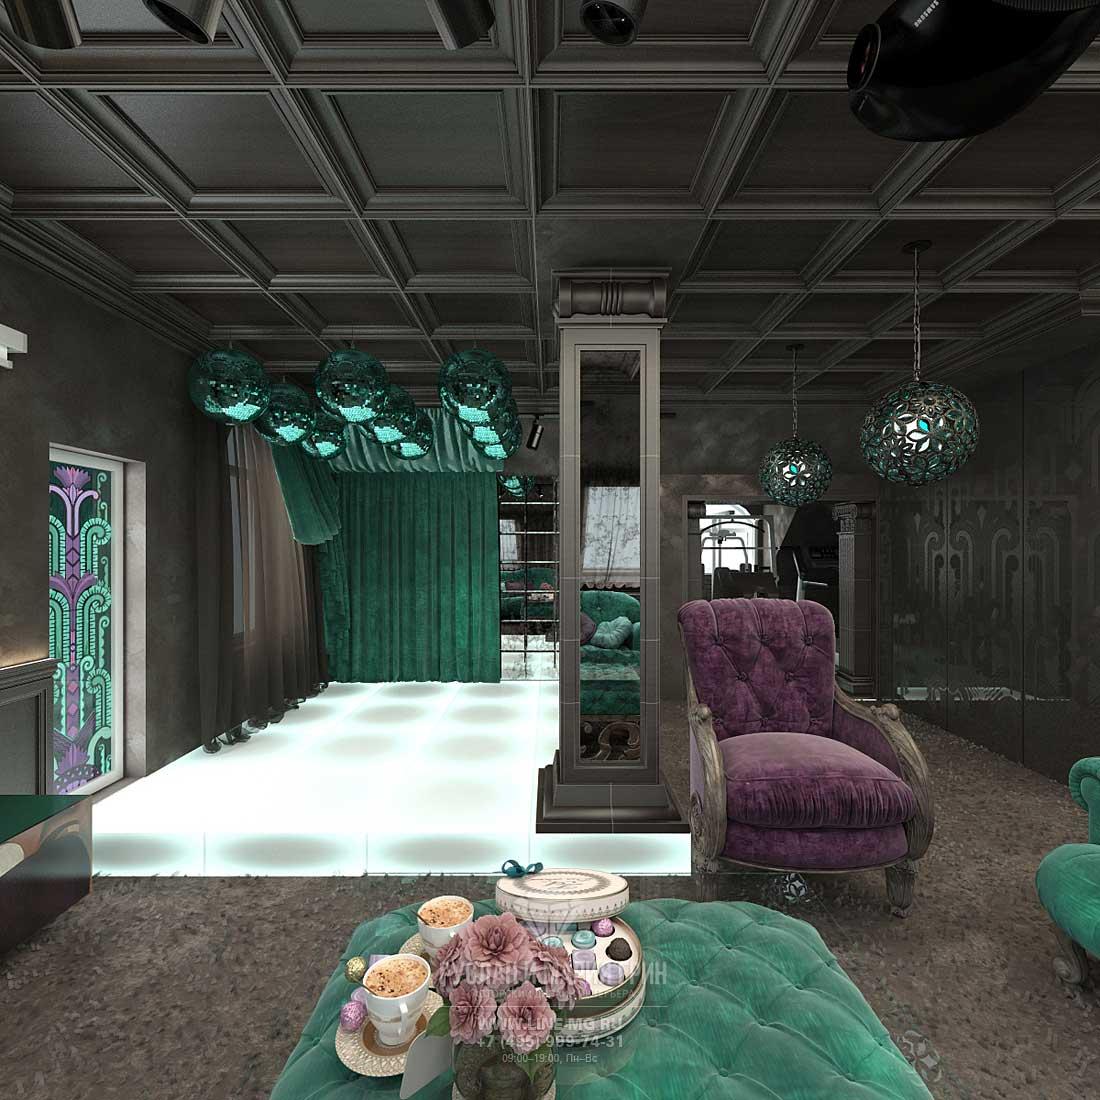 Интерьер мансардного этажа частного дома. Фото новинка 2015